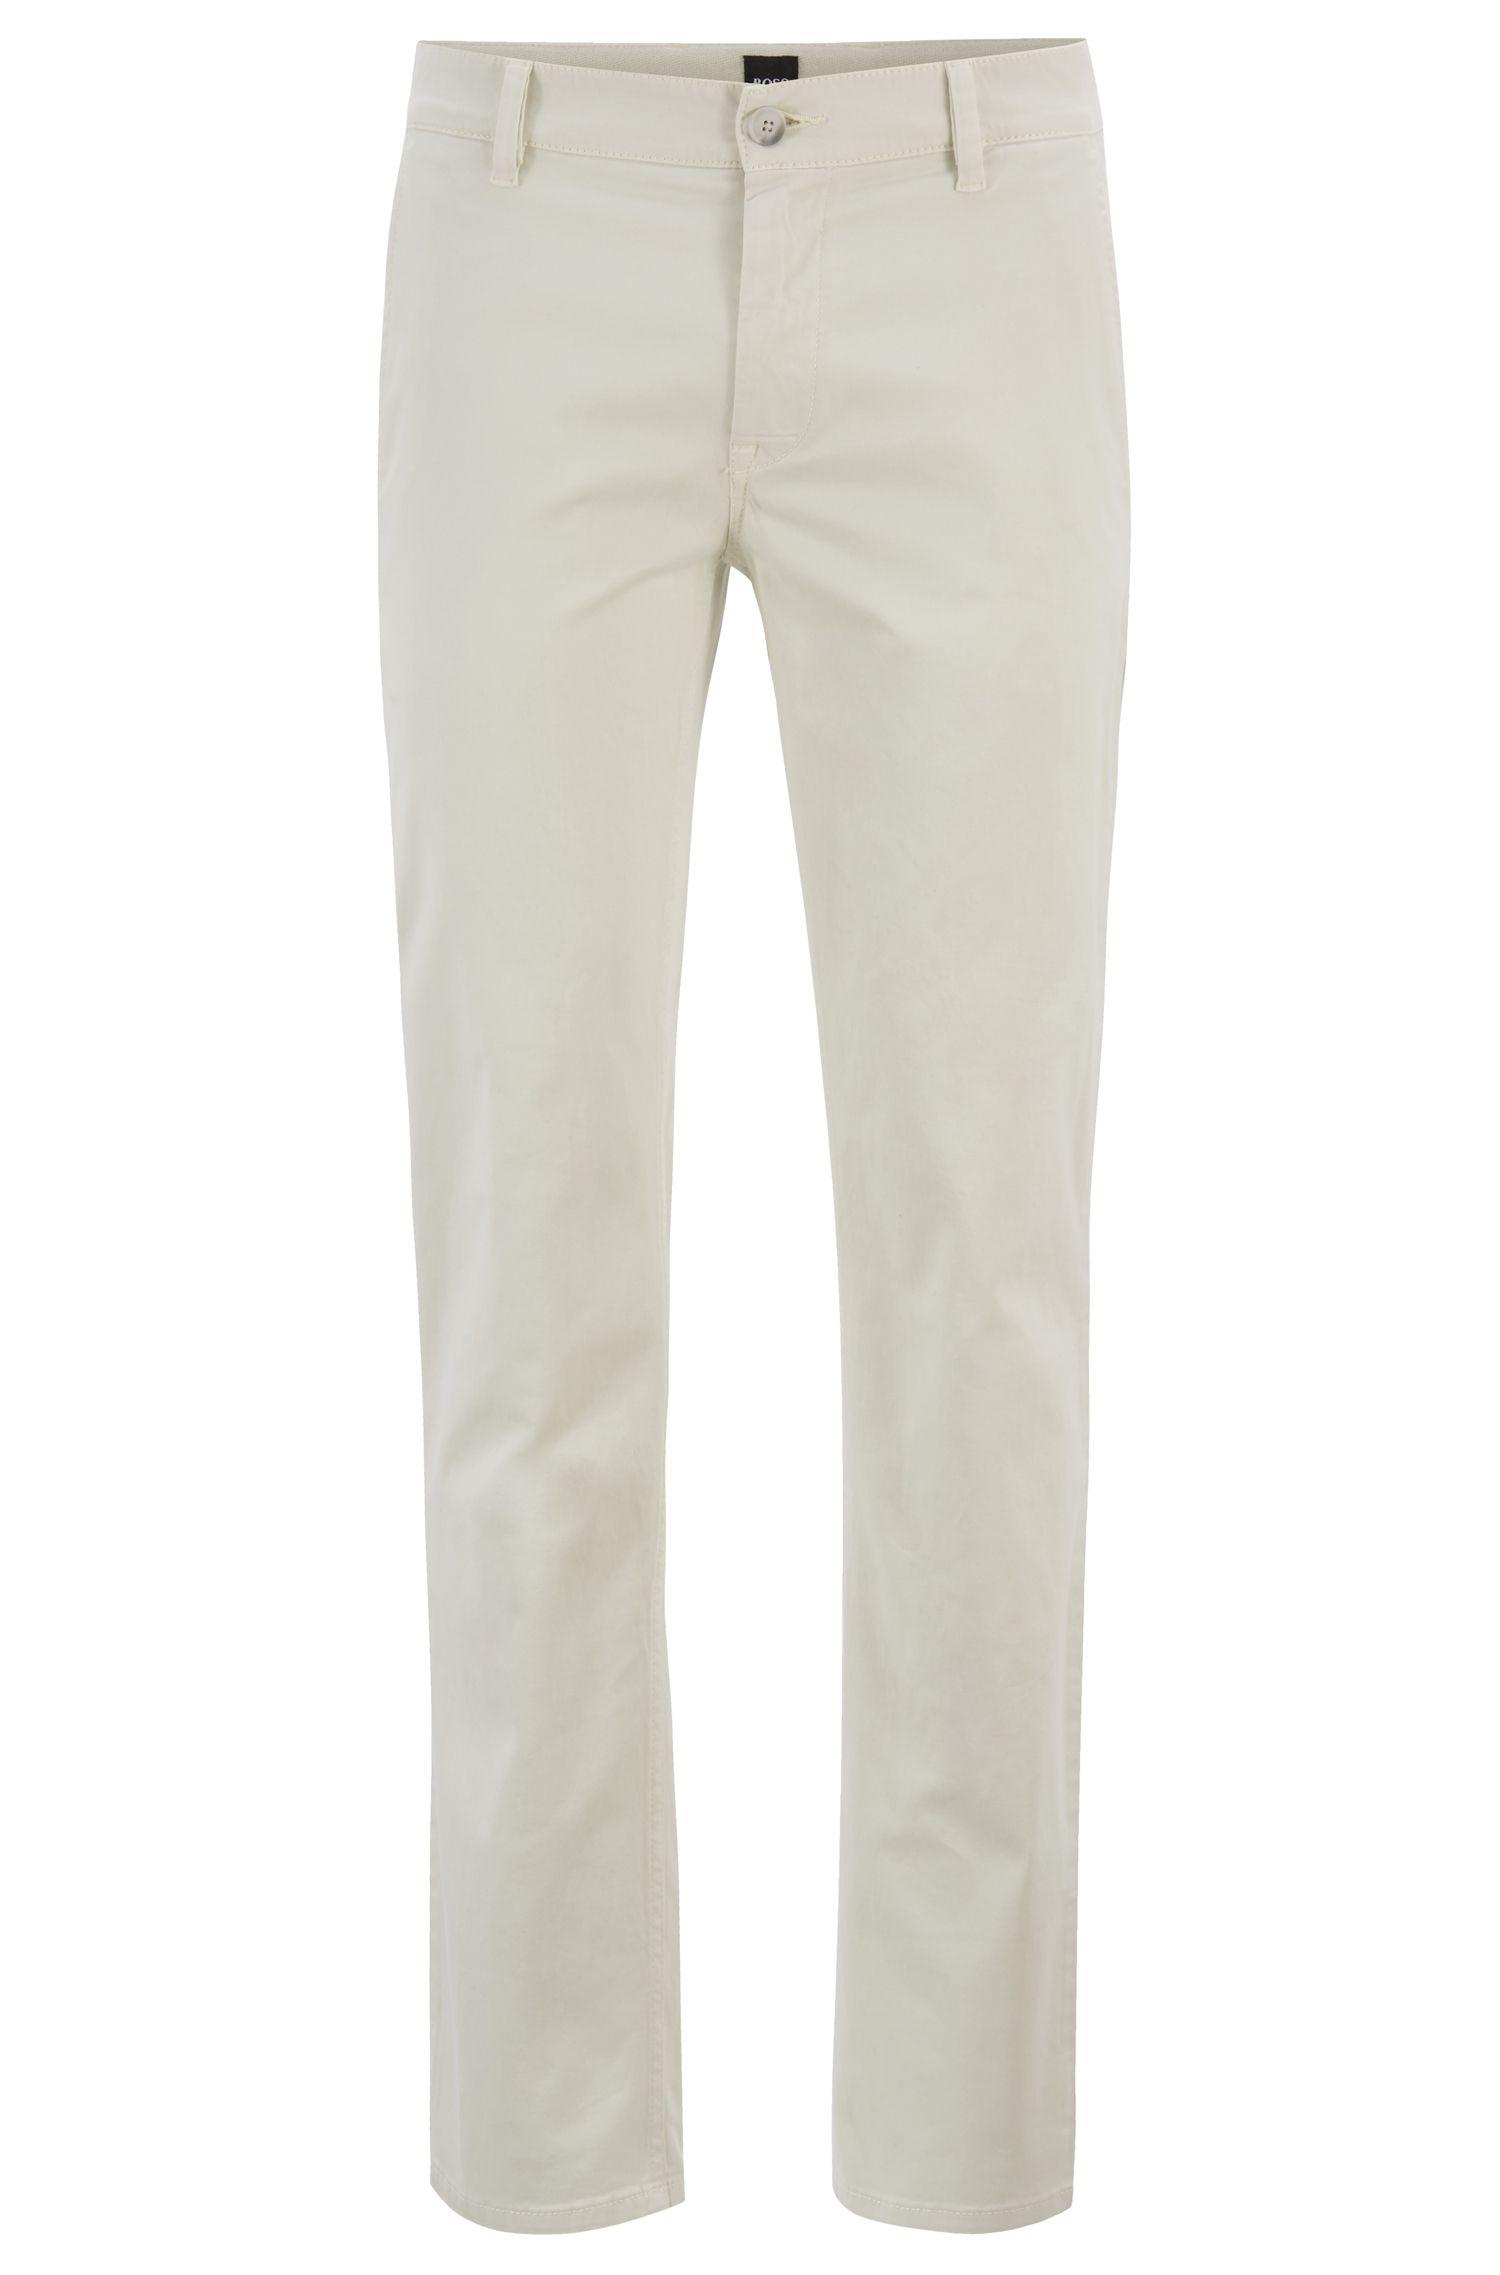 Chino casual Slim Fit en coton stretch brossé, Beige clair